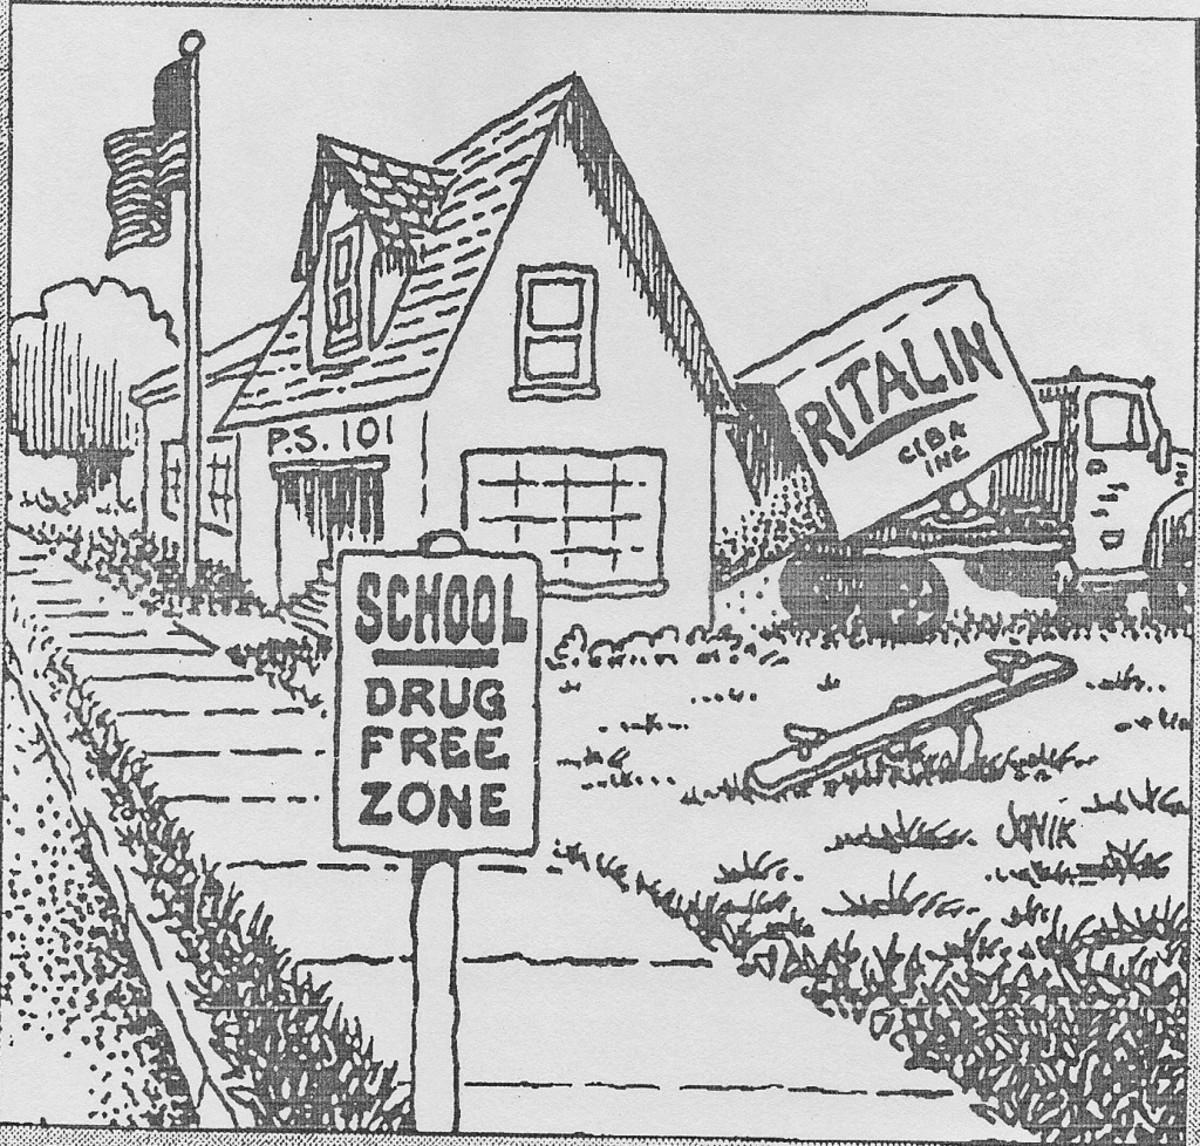 DRUG FREE ZONE IN PUBLIC SCHOOLS